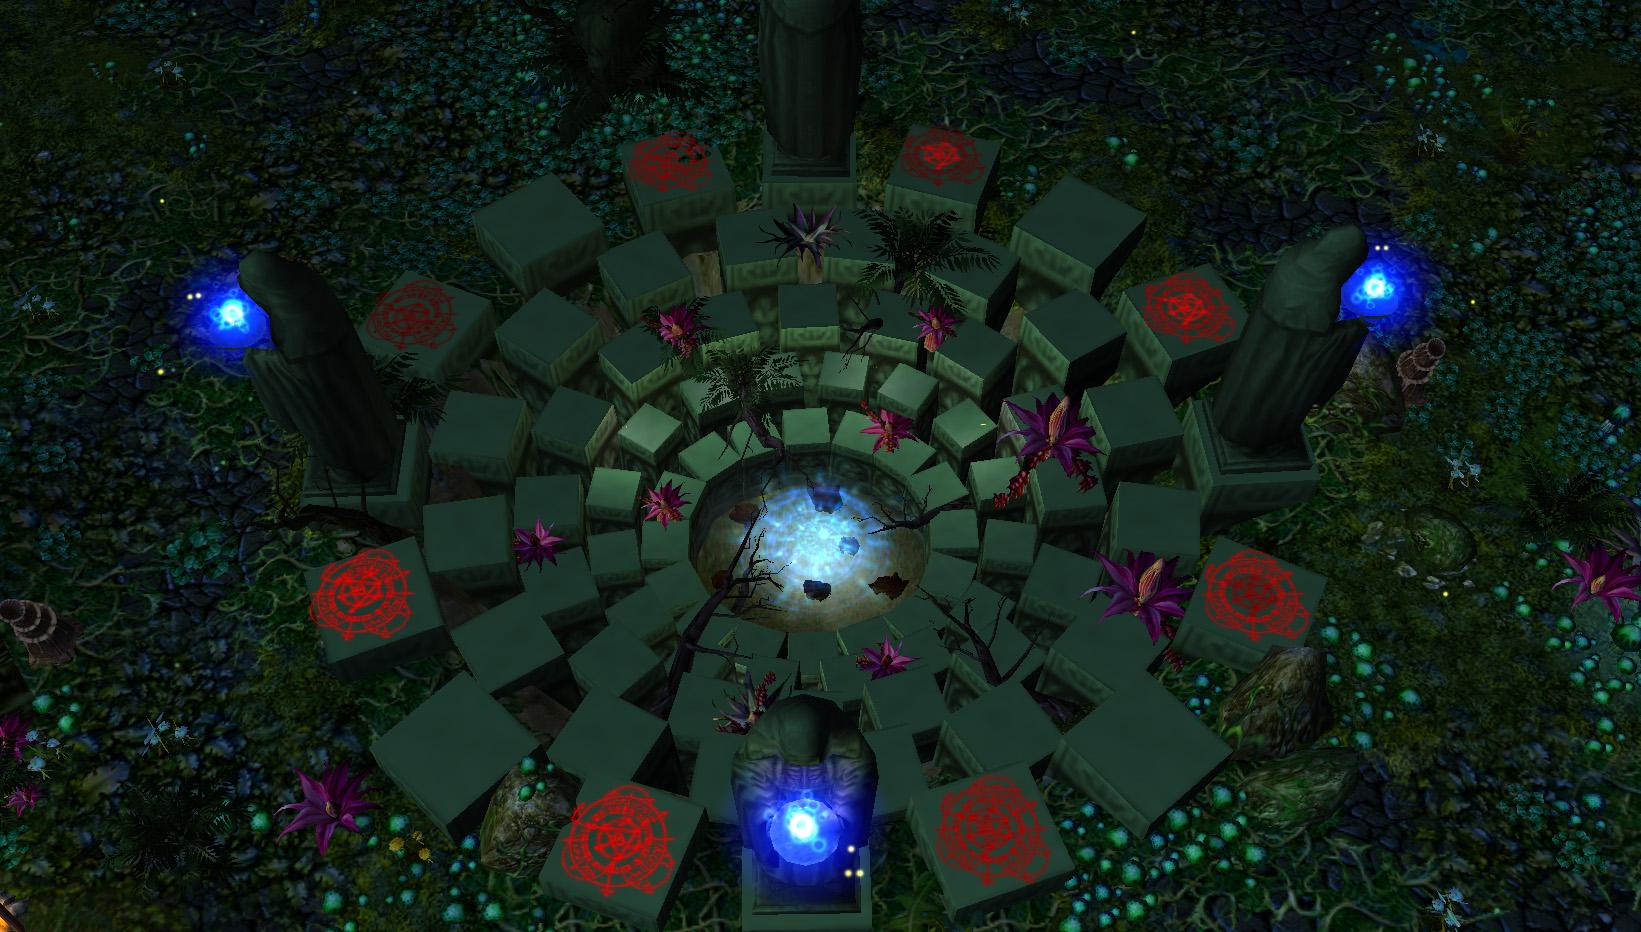 http://xgm.guru/p/wc3/duel-magicalan-vs-darkowlom